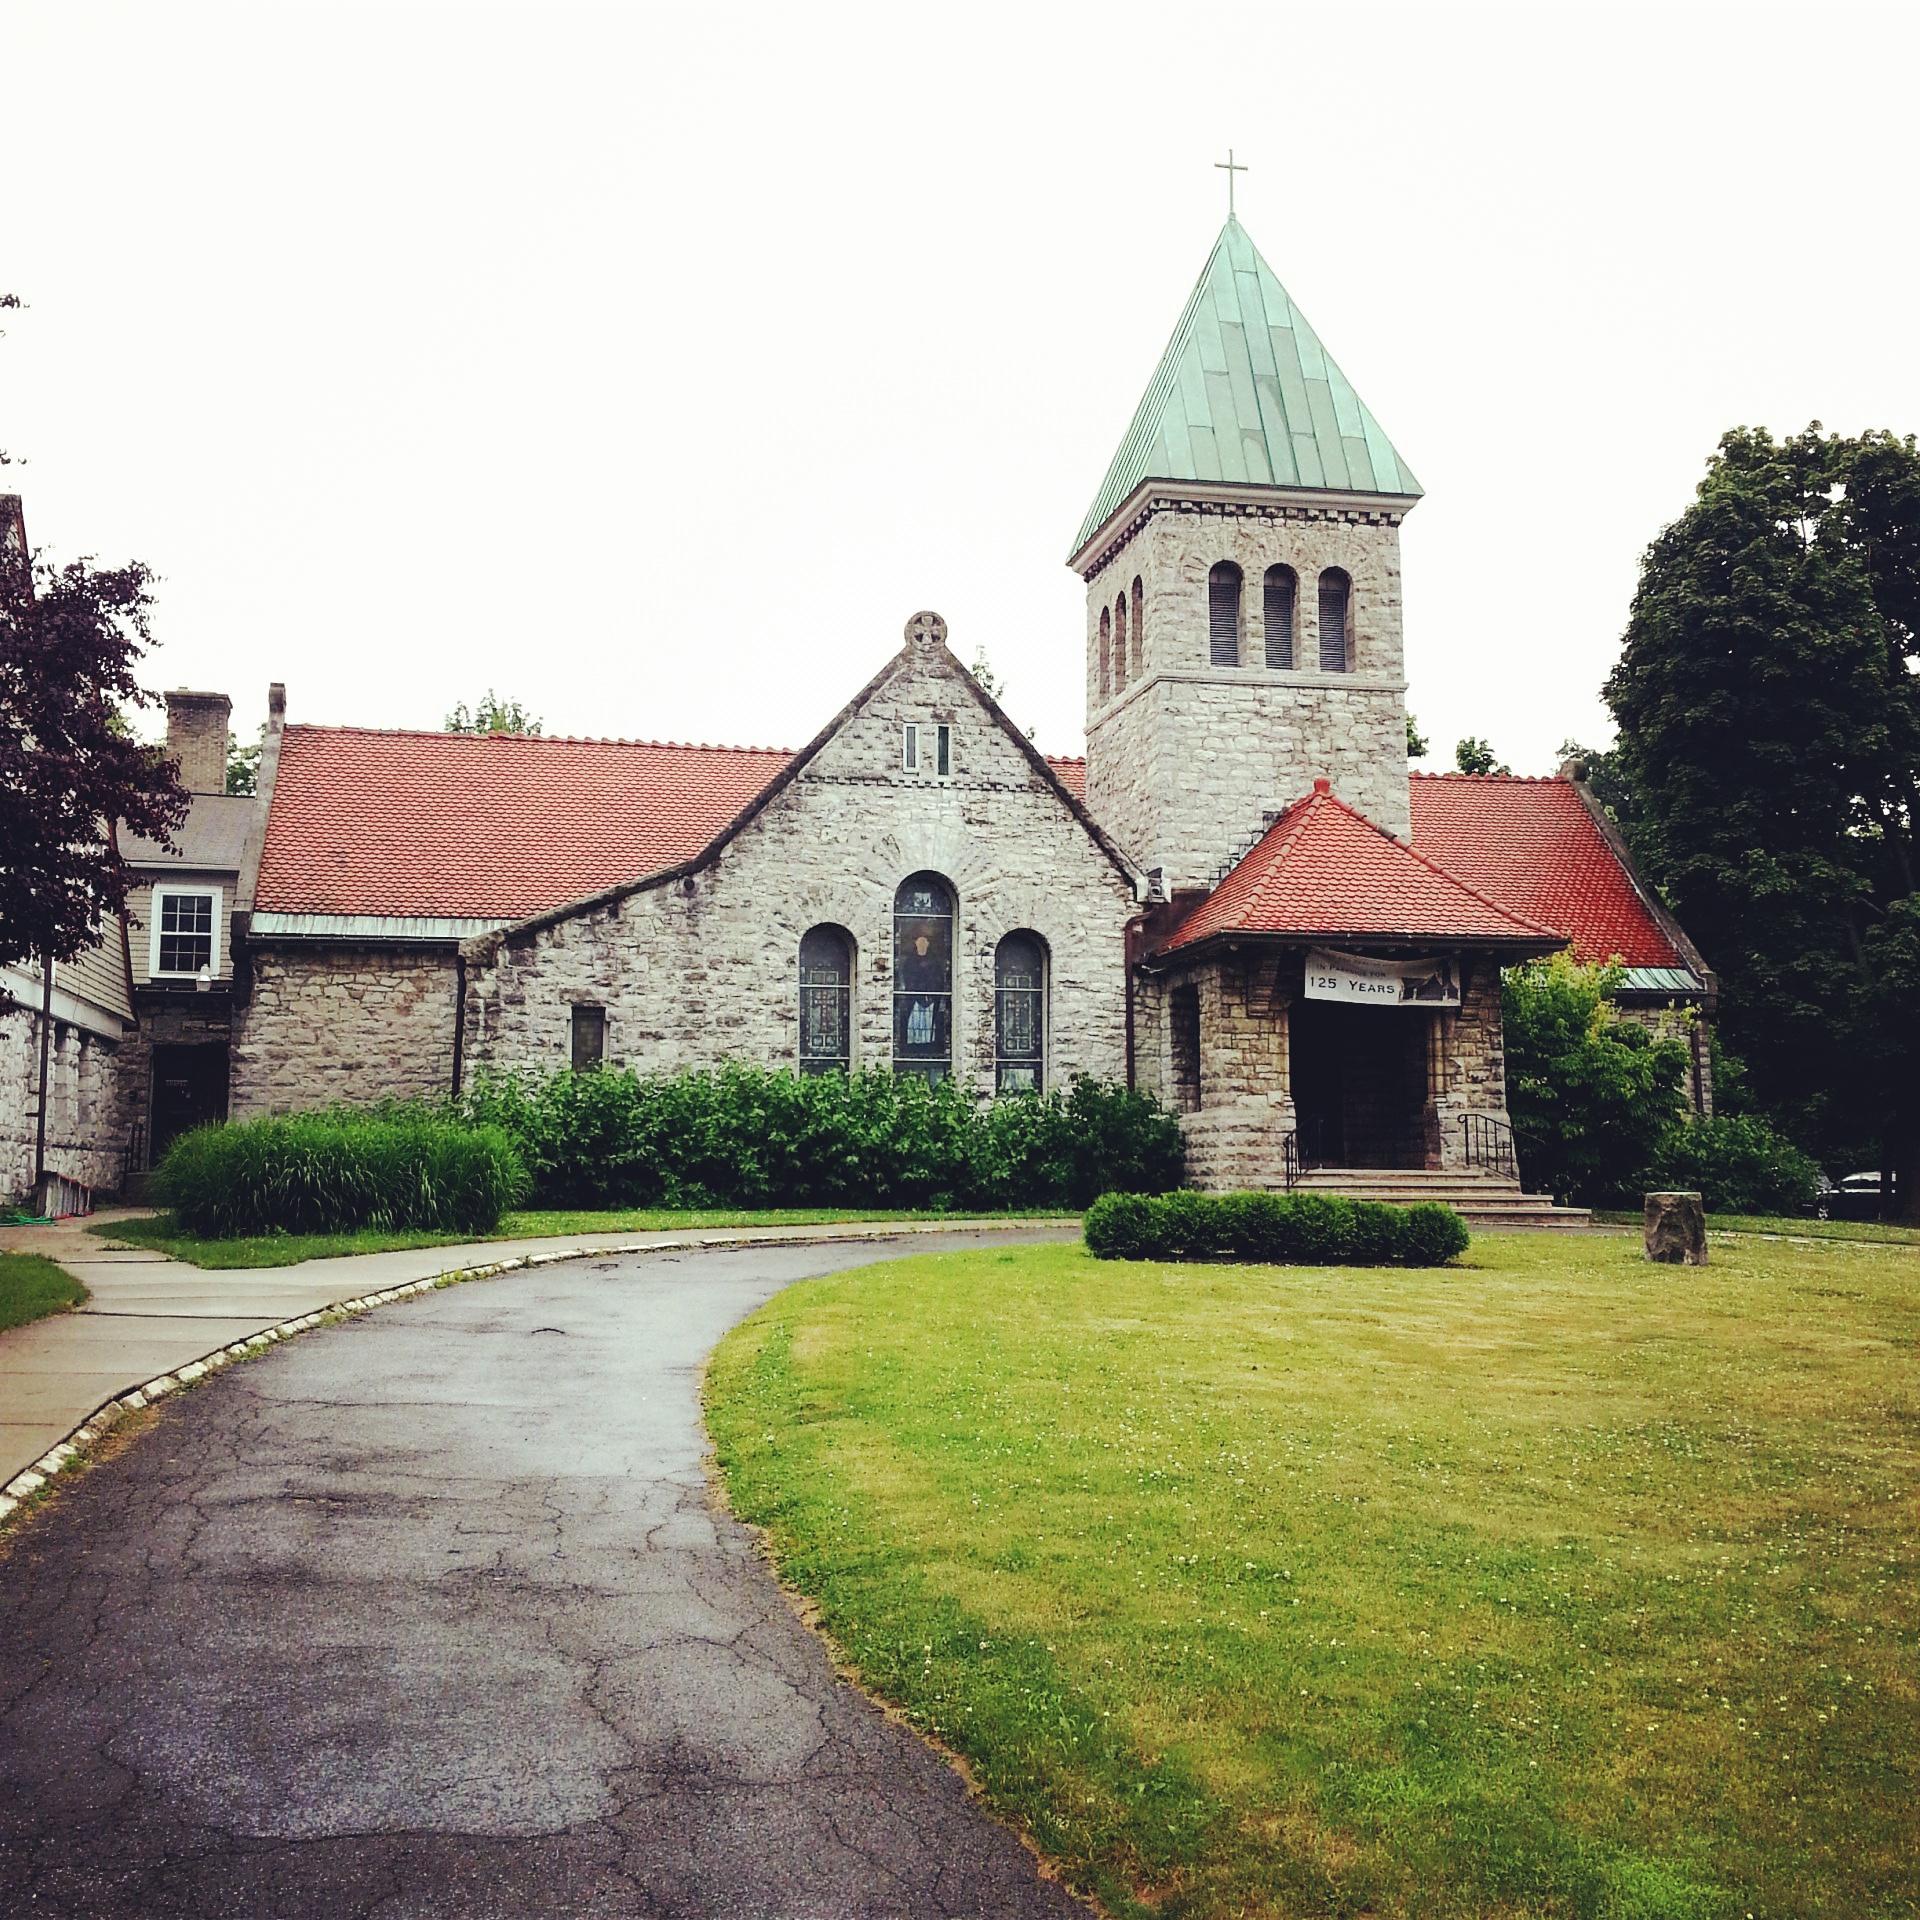 Church Of the Good Shepherd.  Just opposite the Martin's House.